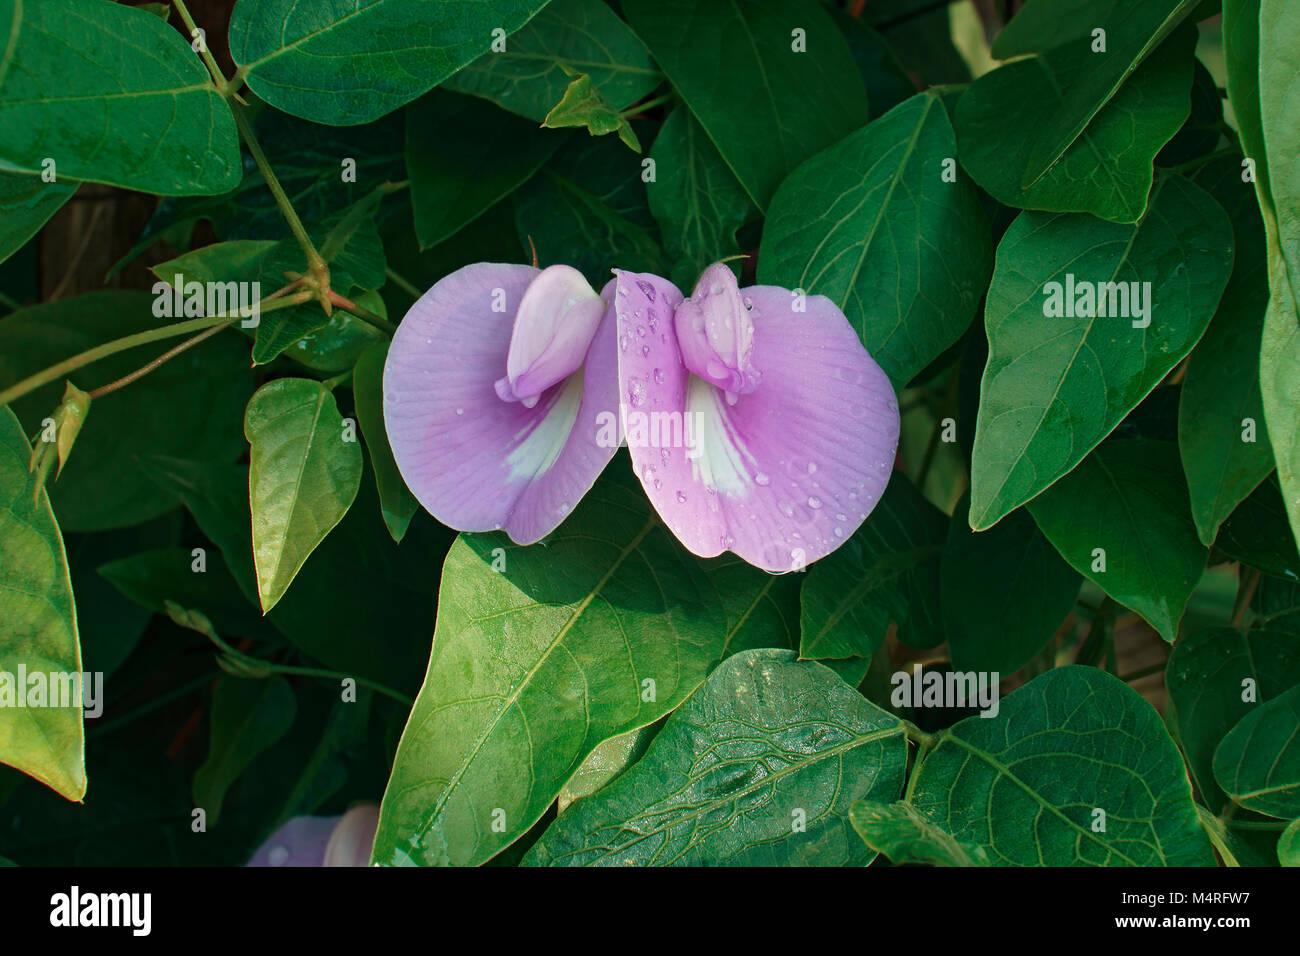 Wild blue vine stock photos wild blue vine stock images alamy spurred butterfly pea centrosema virginianum called wild blue vine blue bell and izmirmasajfo